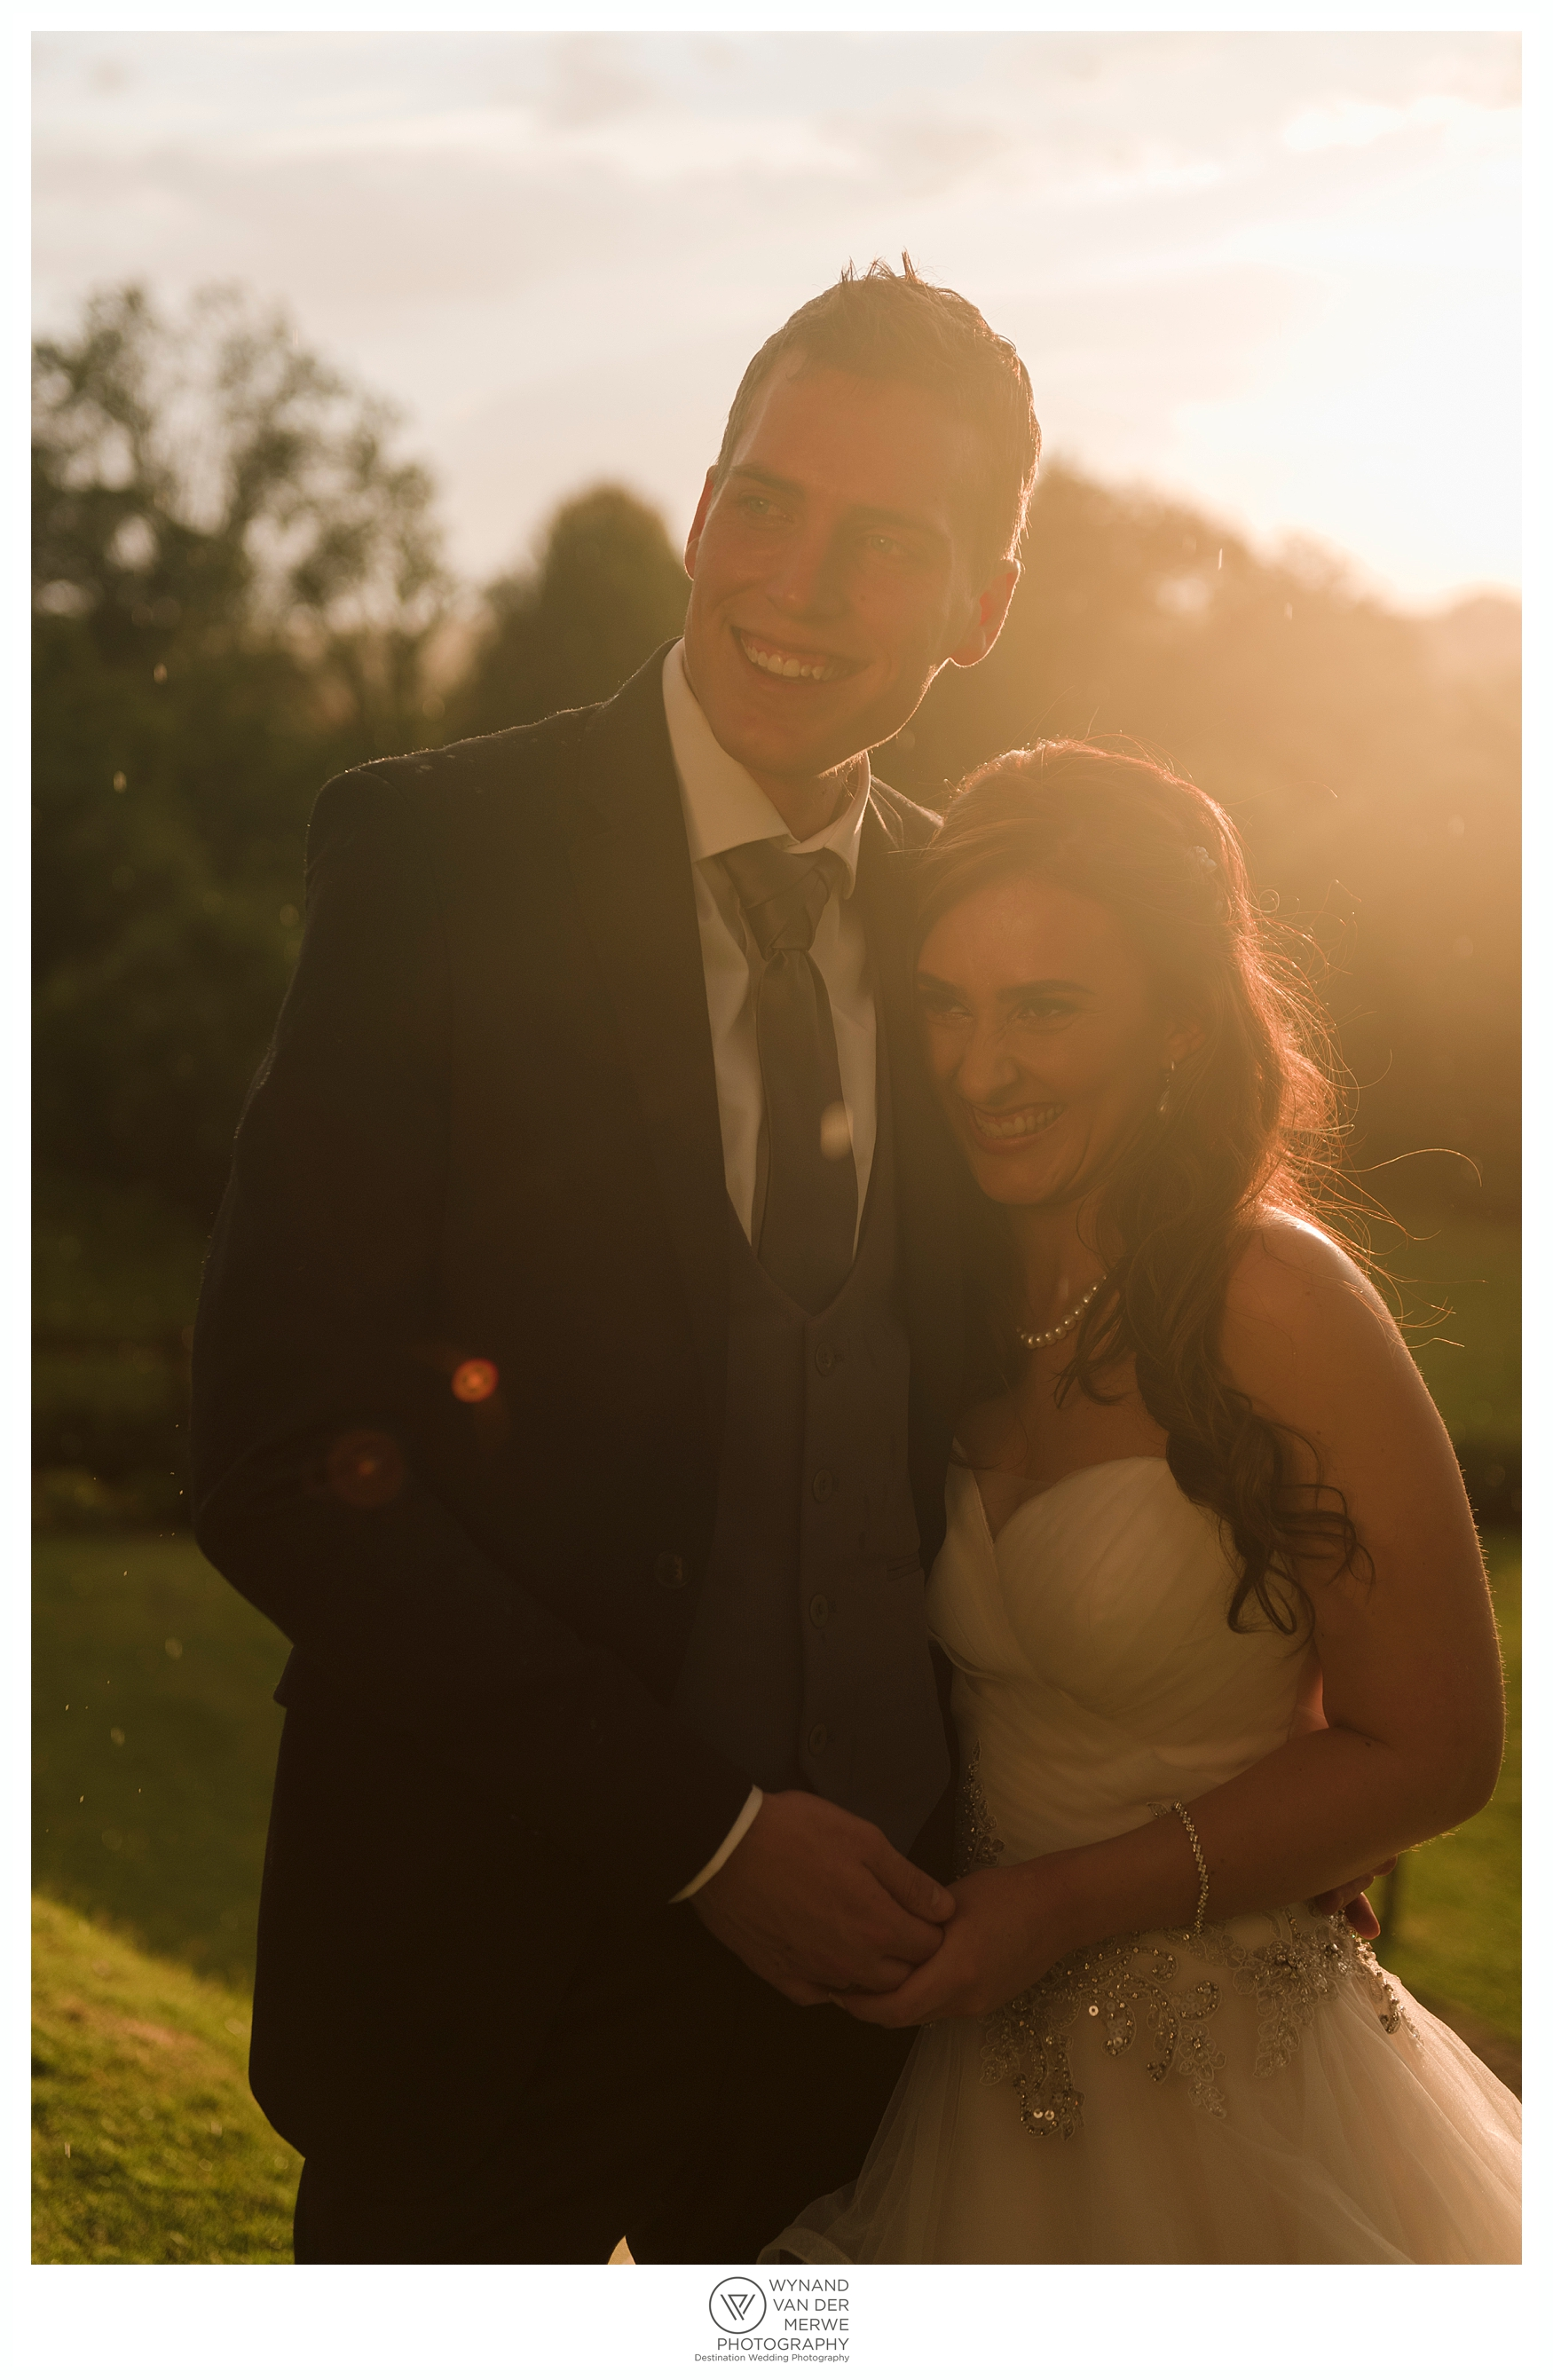 Wynandvandermerwe ryan natalia wedding photography cradle valley guesthouse gauteng-486.jpg